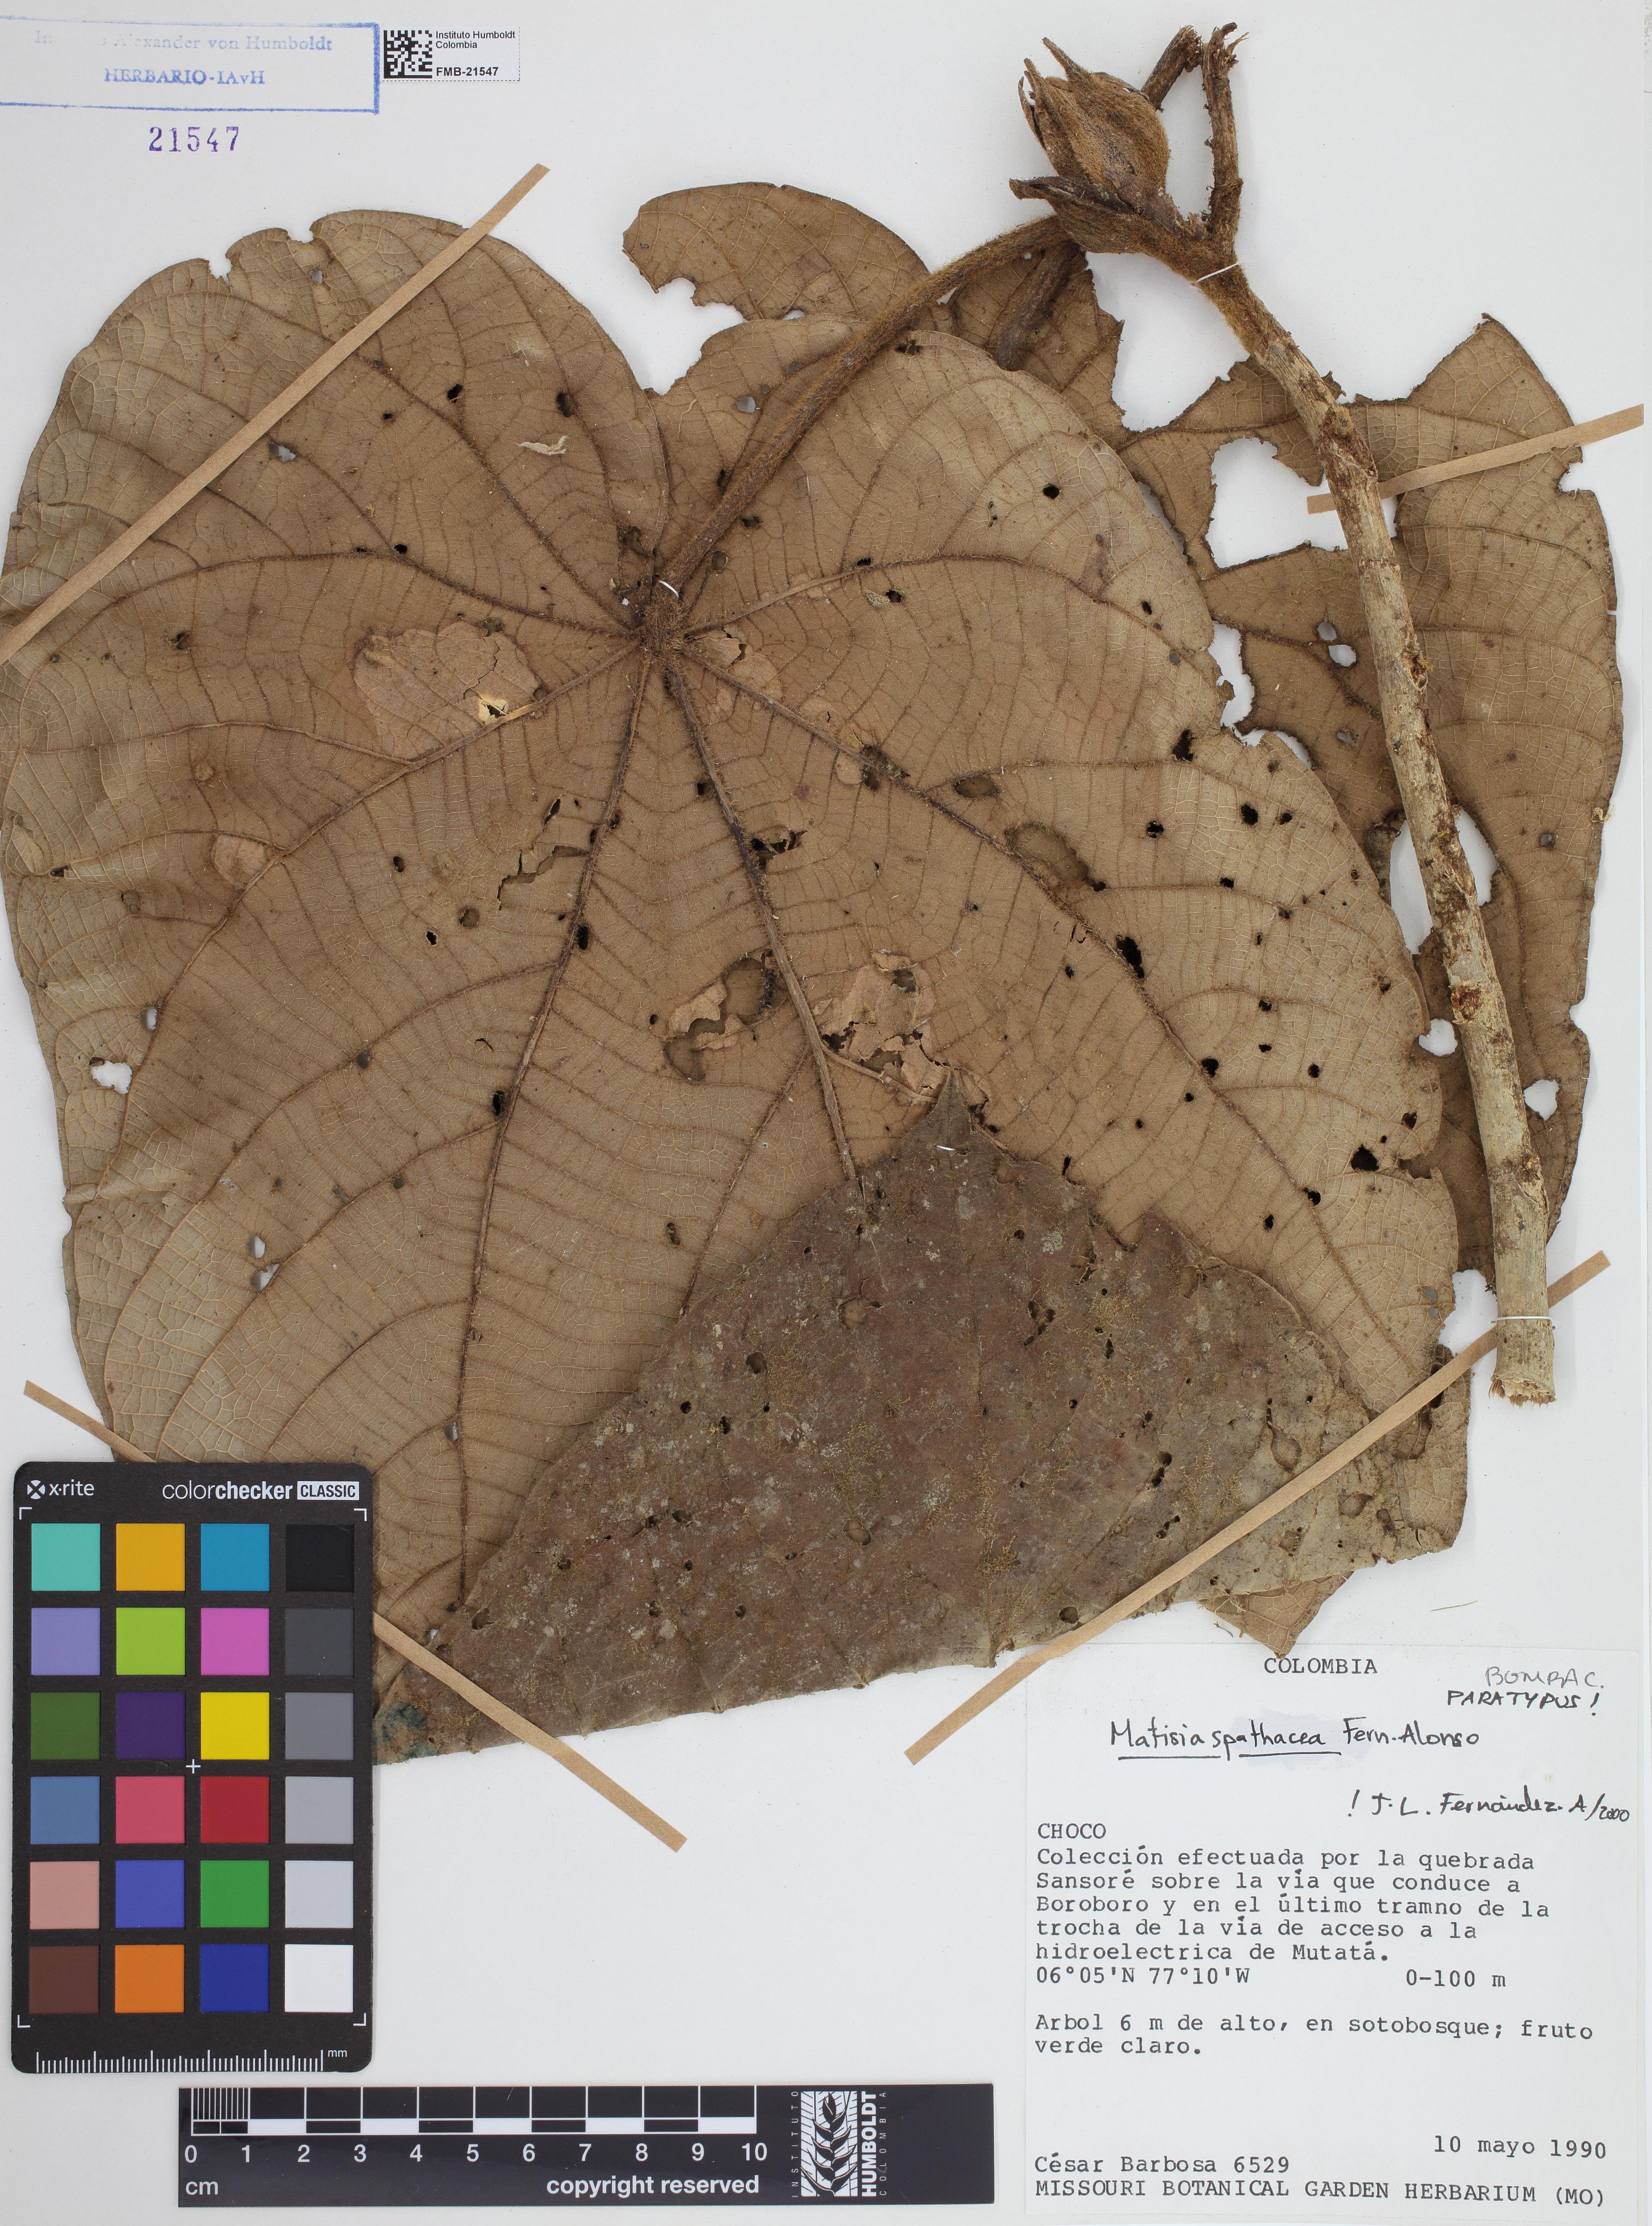 Paratipo de <em>Matisia spathacea</em>, FMB-21547, Fotografía por Robles A.